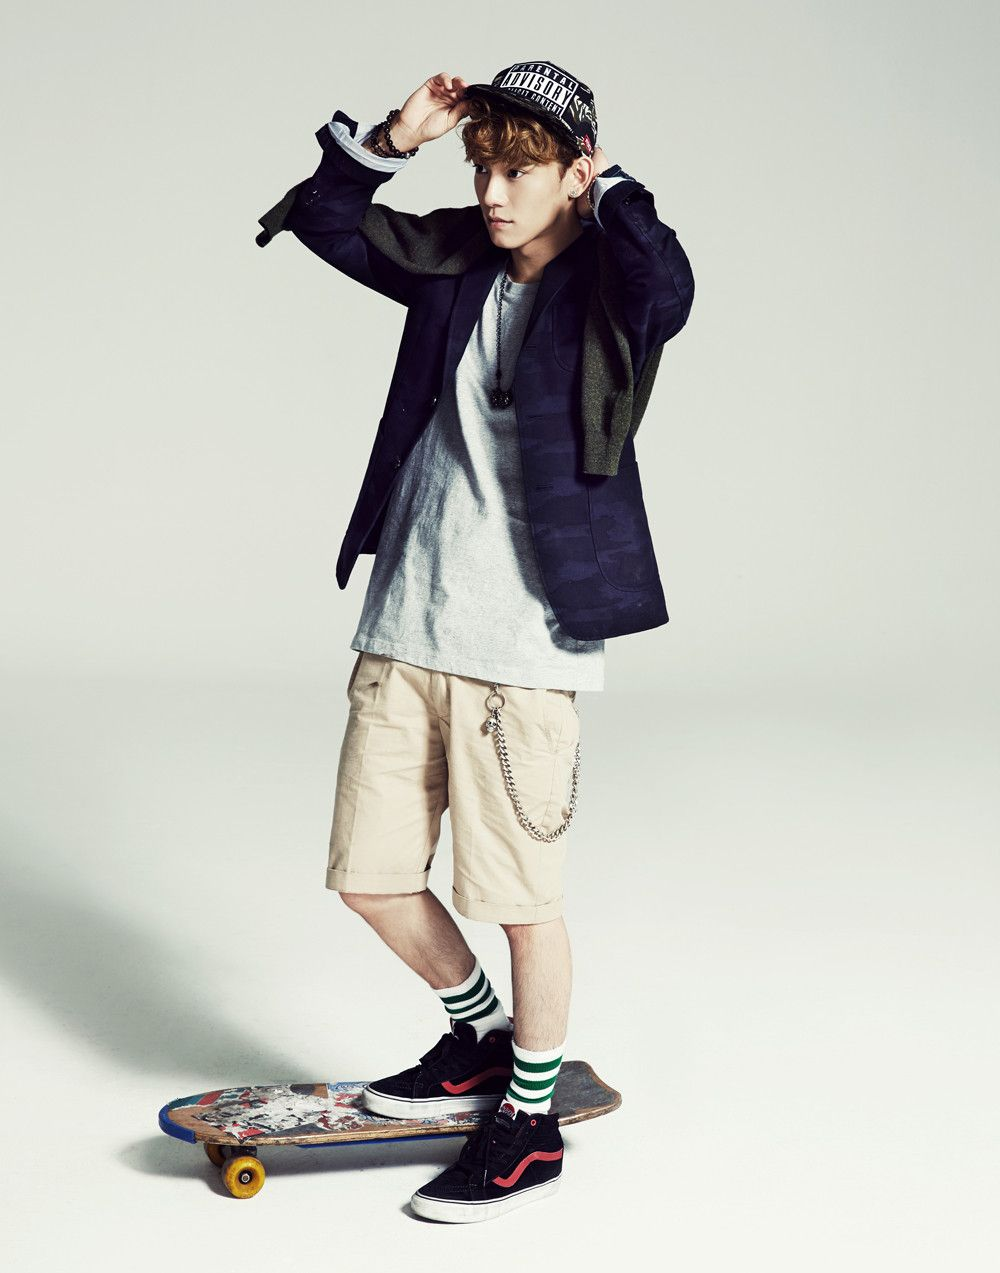 exo   : :  2014 calender chen cut  #exo #12 #kpop #smboys #kpopmap #chen #jongdae #exom